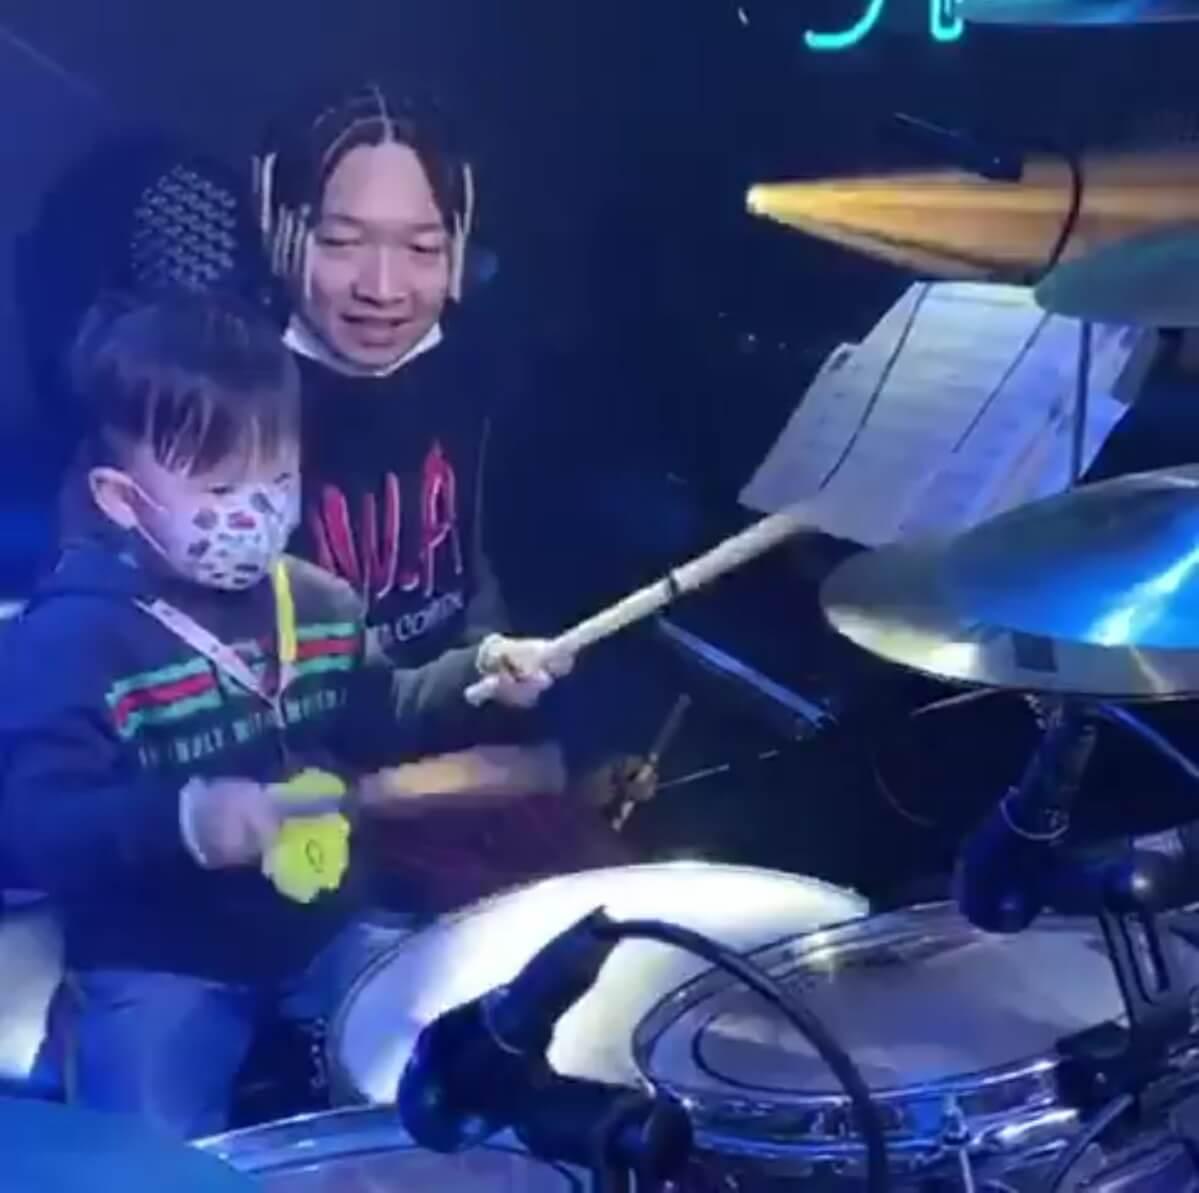 Jazz對拍子感非常敏銳,經過Kevin Boy的指導,打鼓已有板有眼。